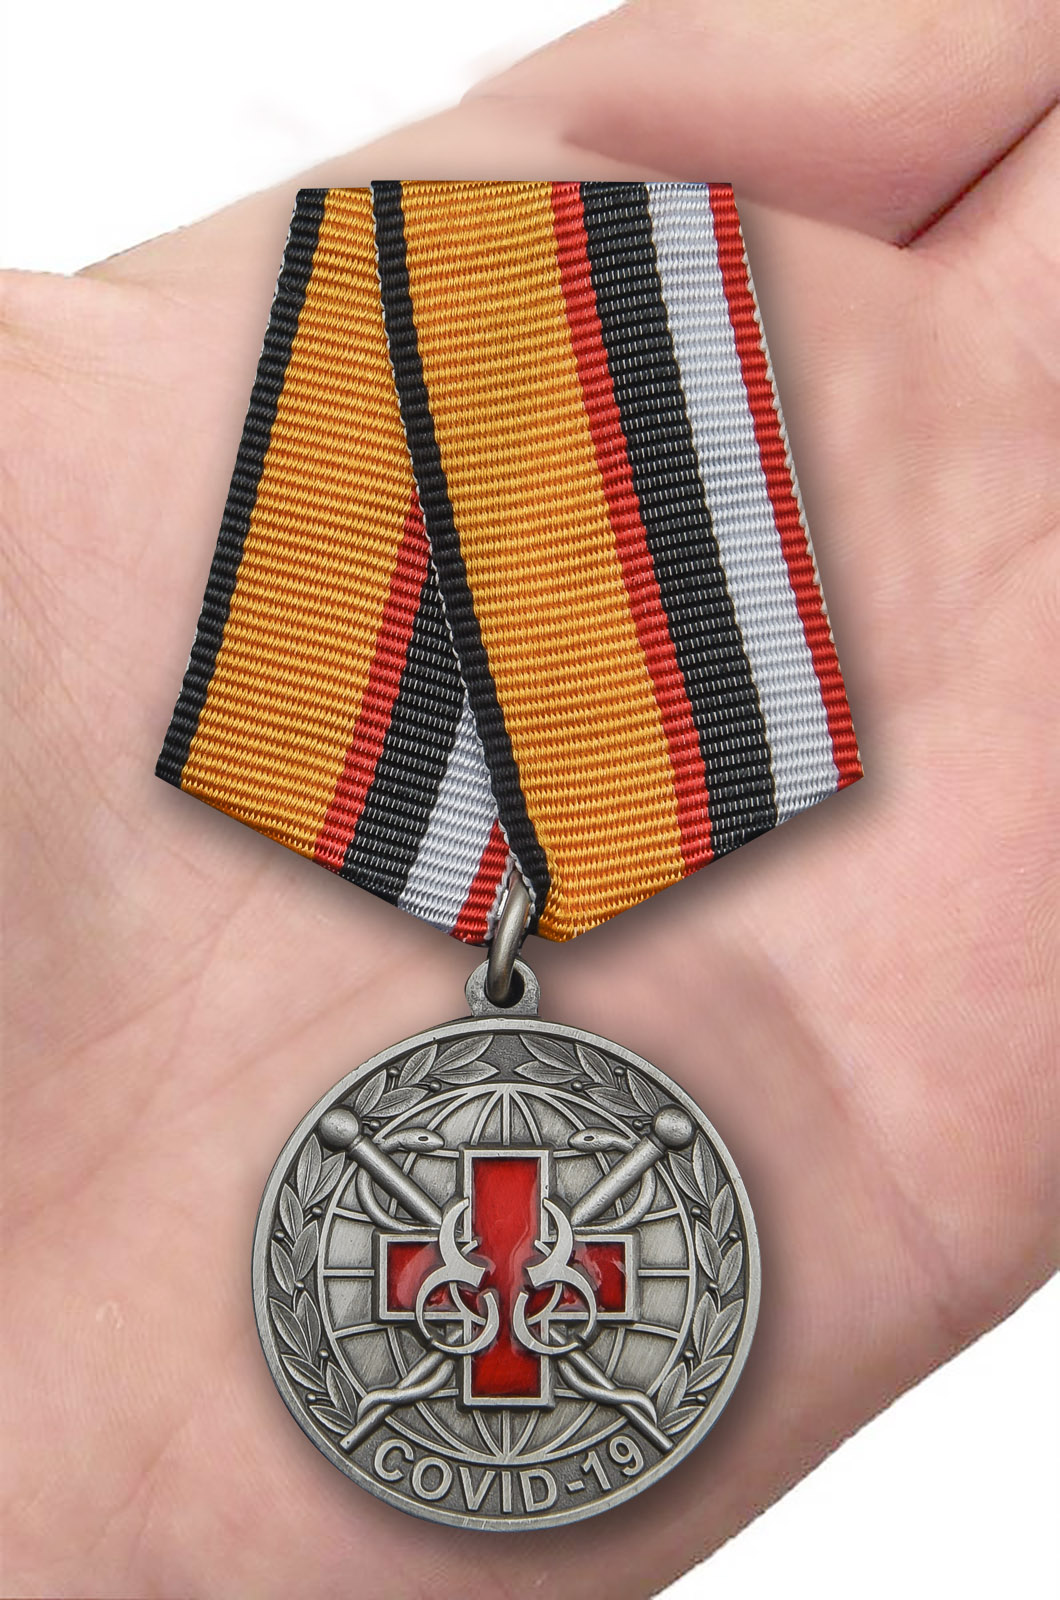 Памятная медаль За борьбу с пандемией COVID-19 - вид на ладони